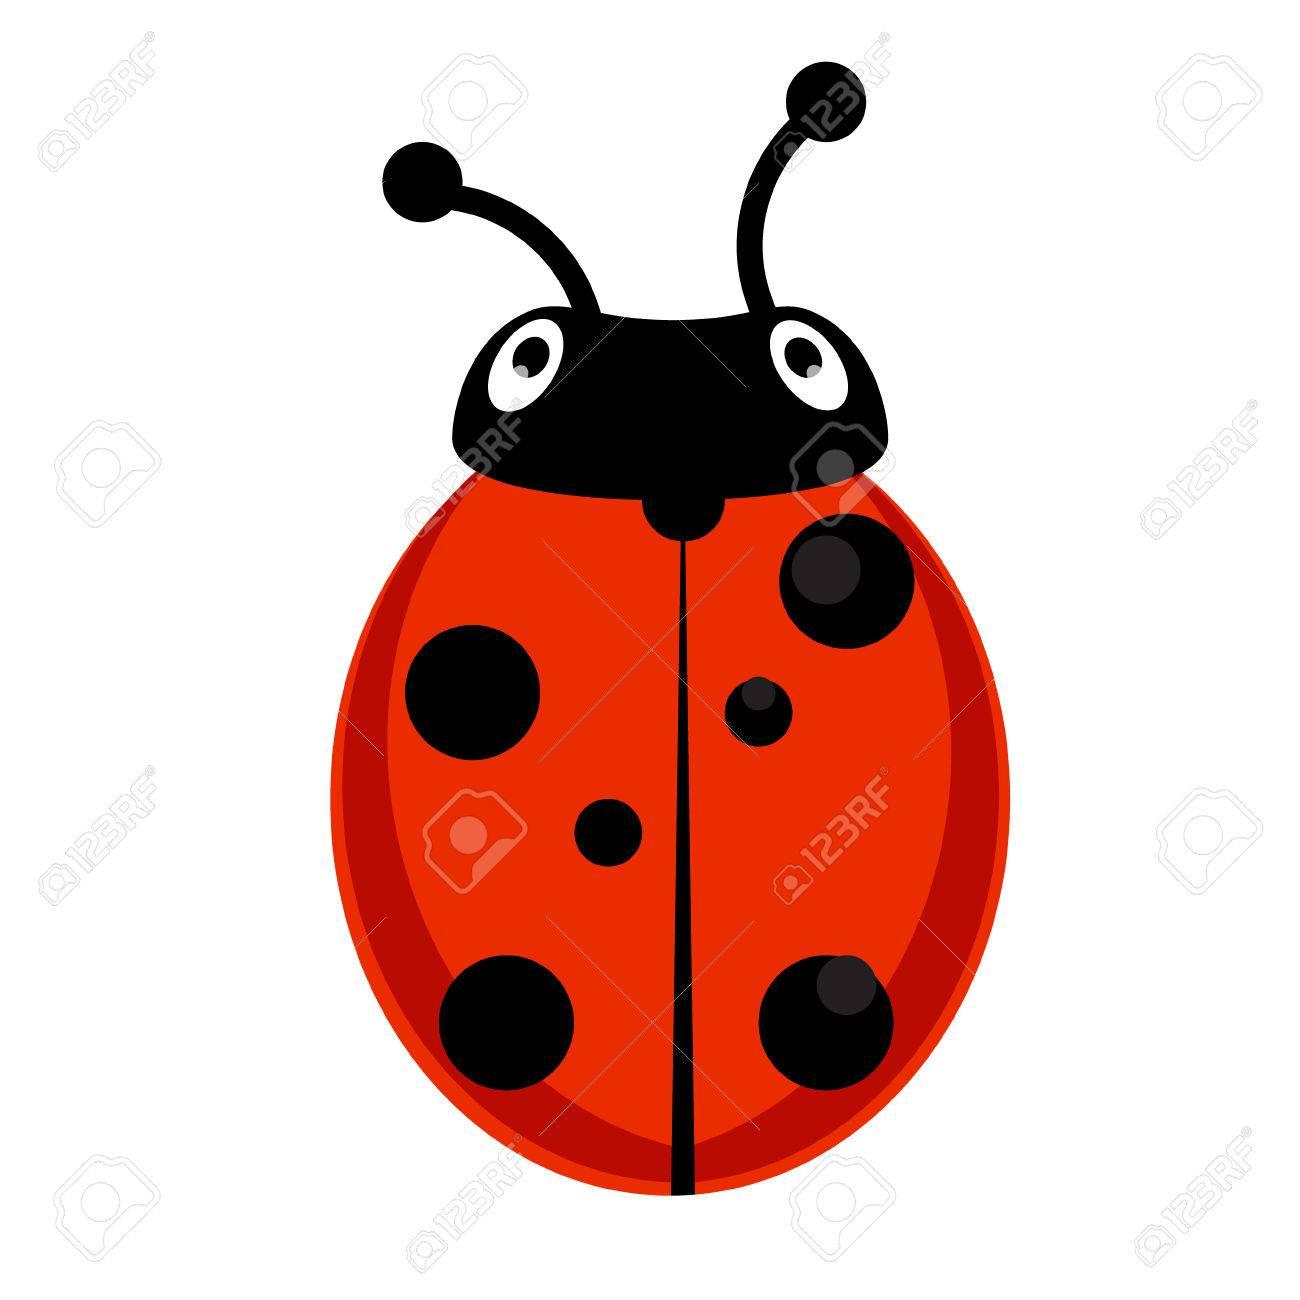 Illustration   Raster Illustration Insect Ladybird. Cute Ladybug Cartoon  Icon Flat Design.